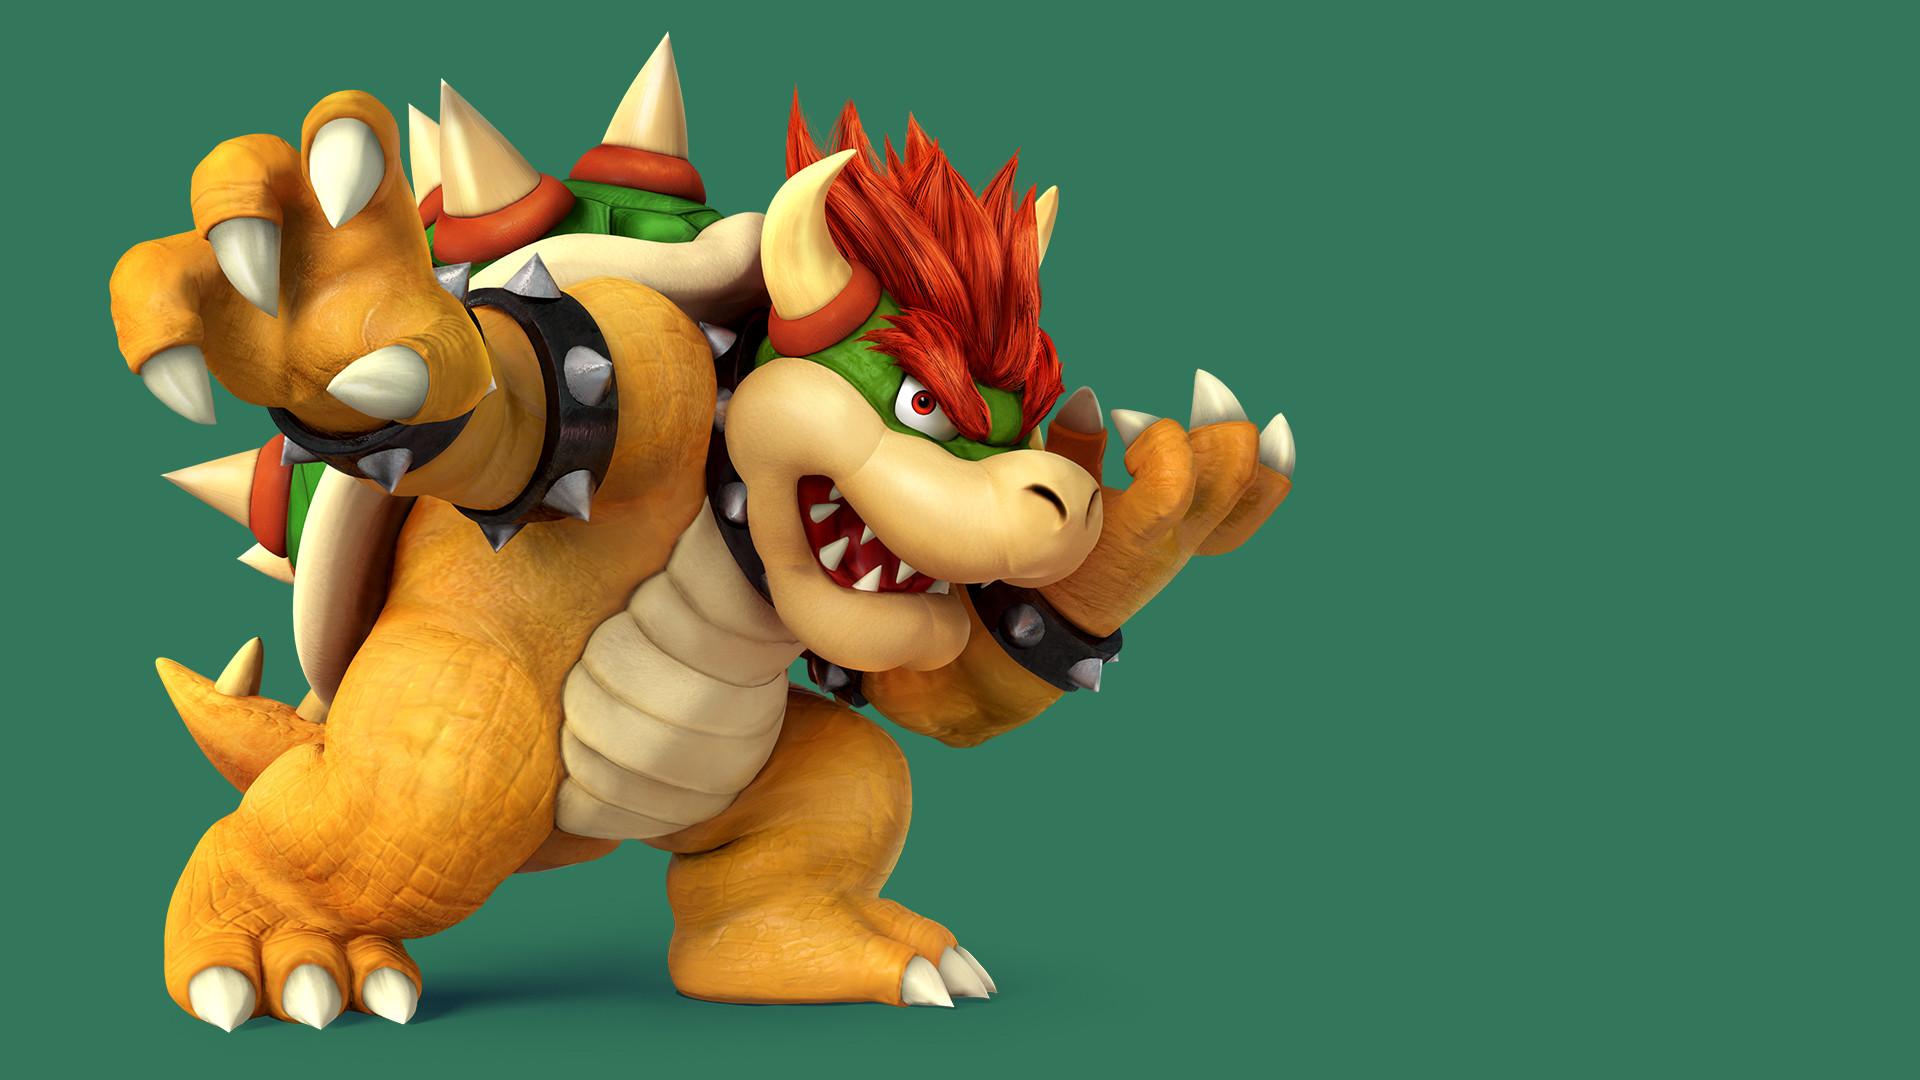 Res: 1920x1080, Smash Wallpaper - Mario Smash Wallpaper - Bowser ...